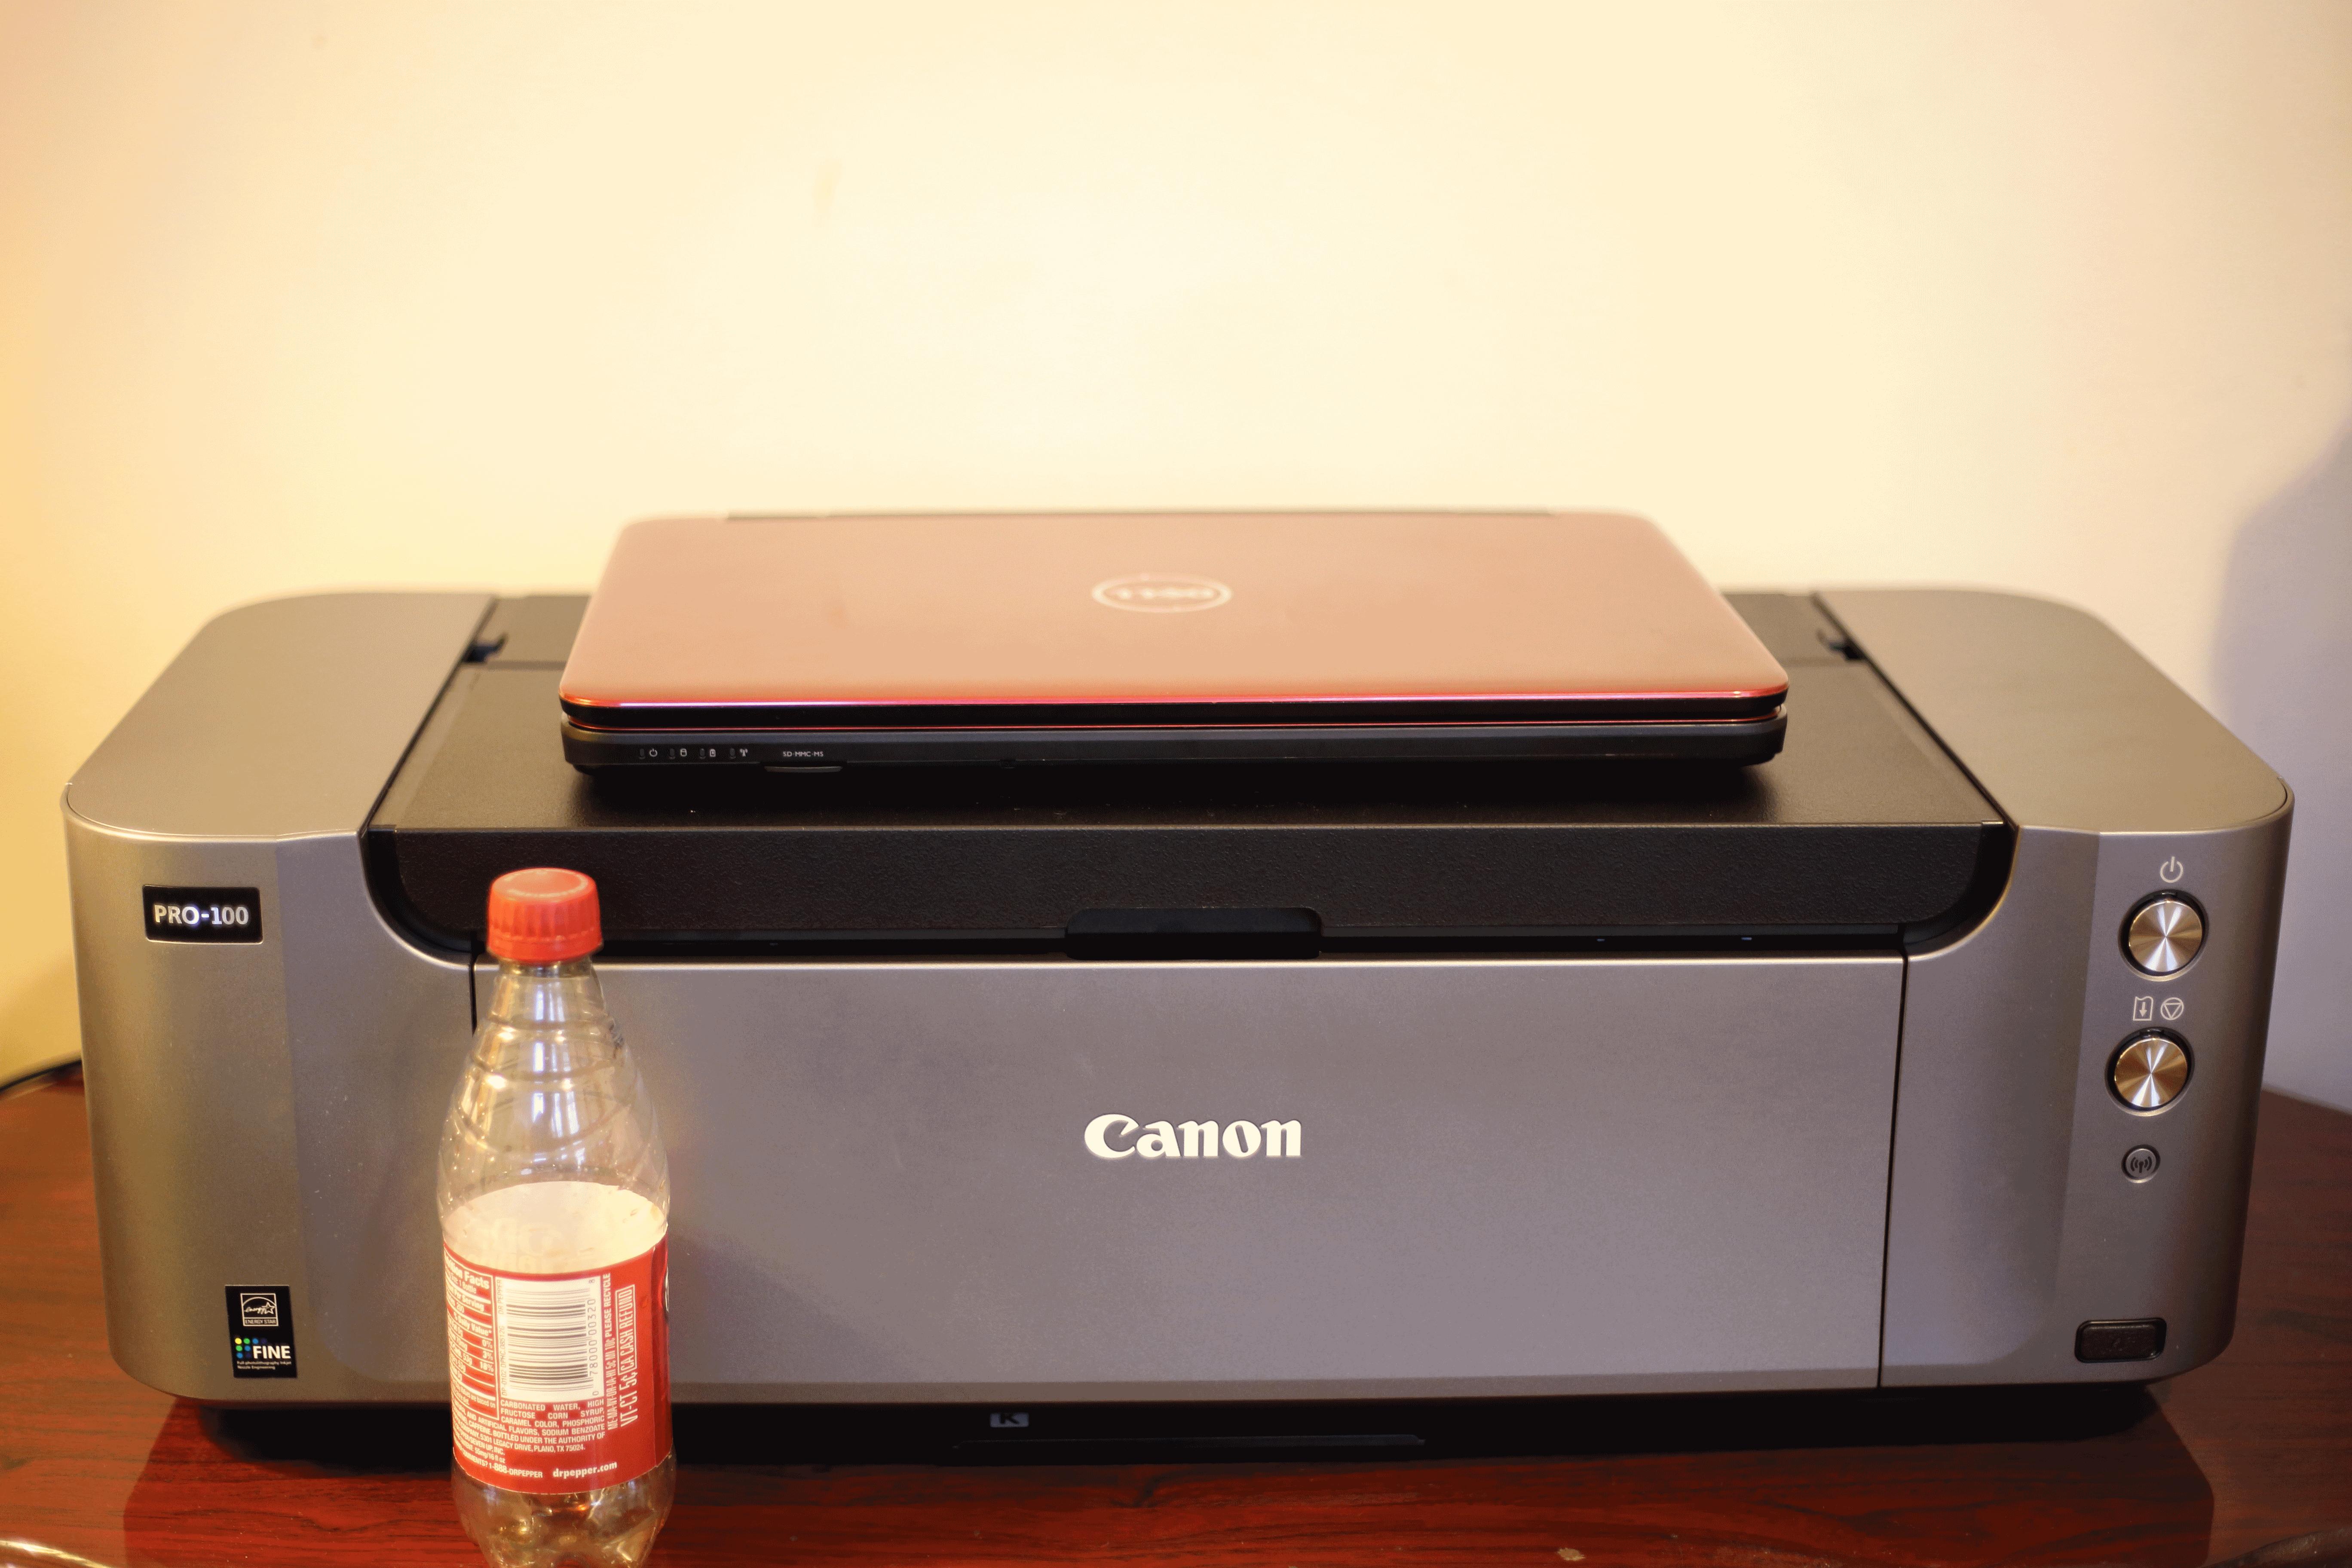 Pro-100, 20 oz bottle, 17 inch Laptop